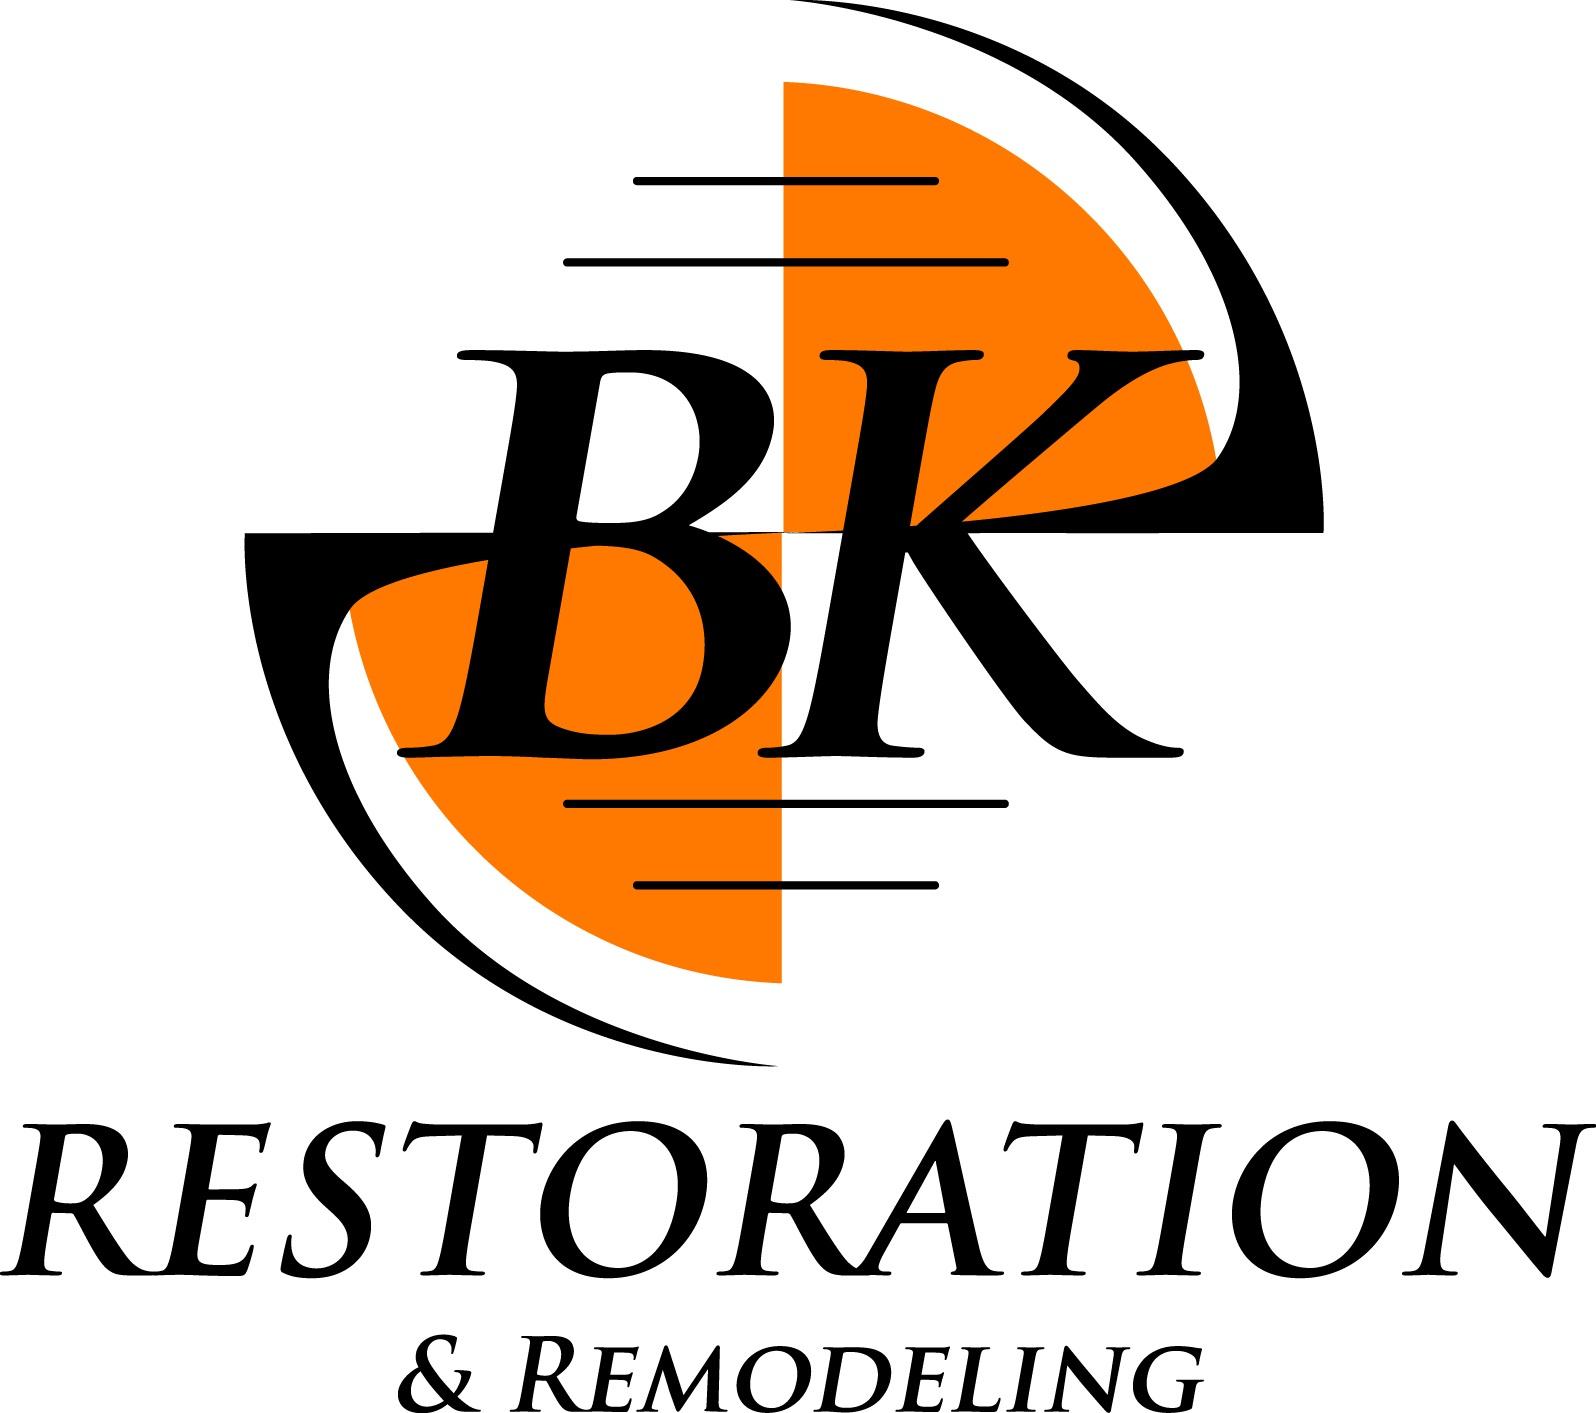 BK Restoration